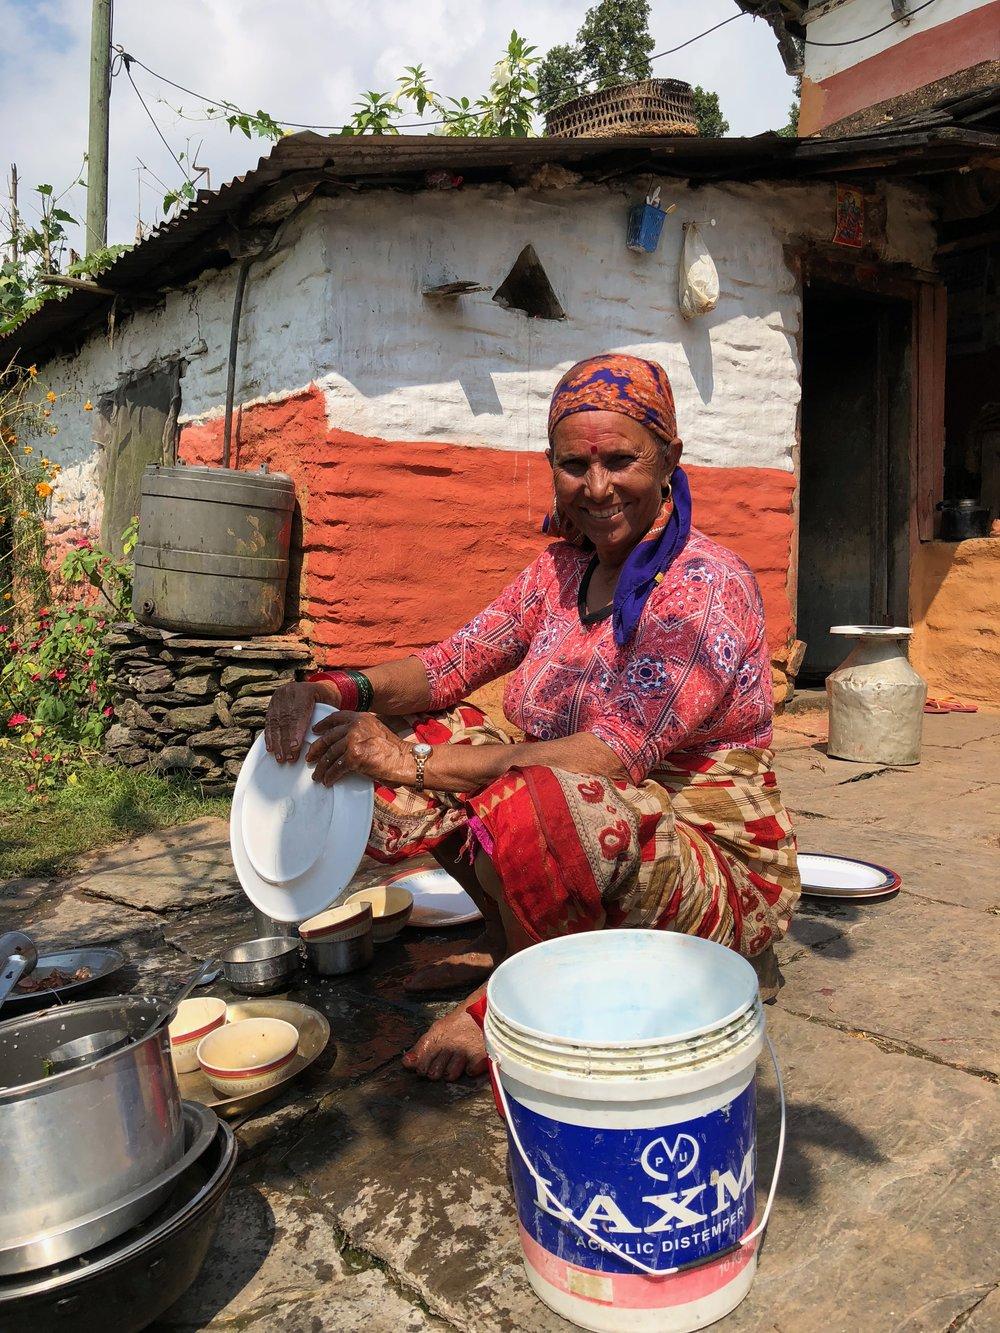 Duara hosts in  Kaskikot  village, near Pokhara, Nepal